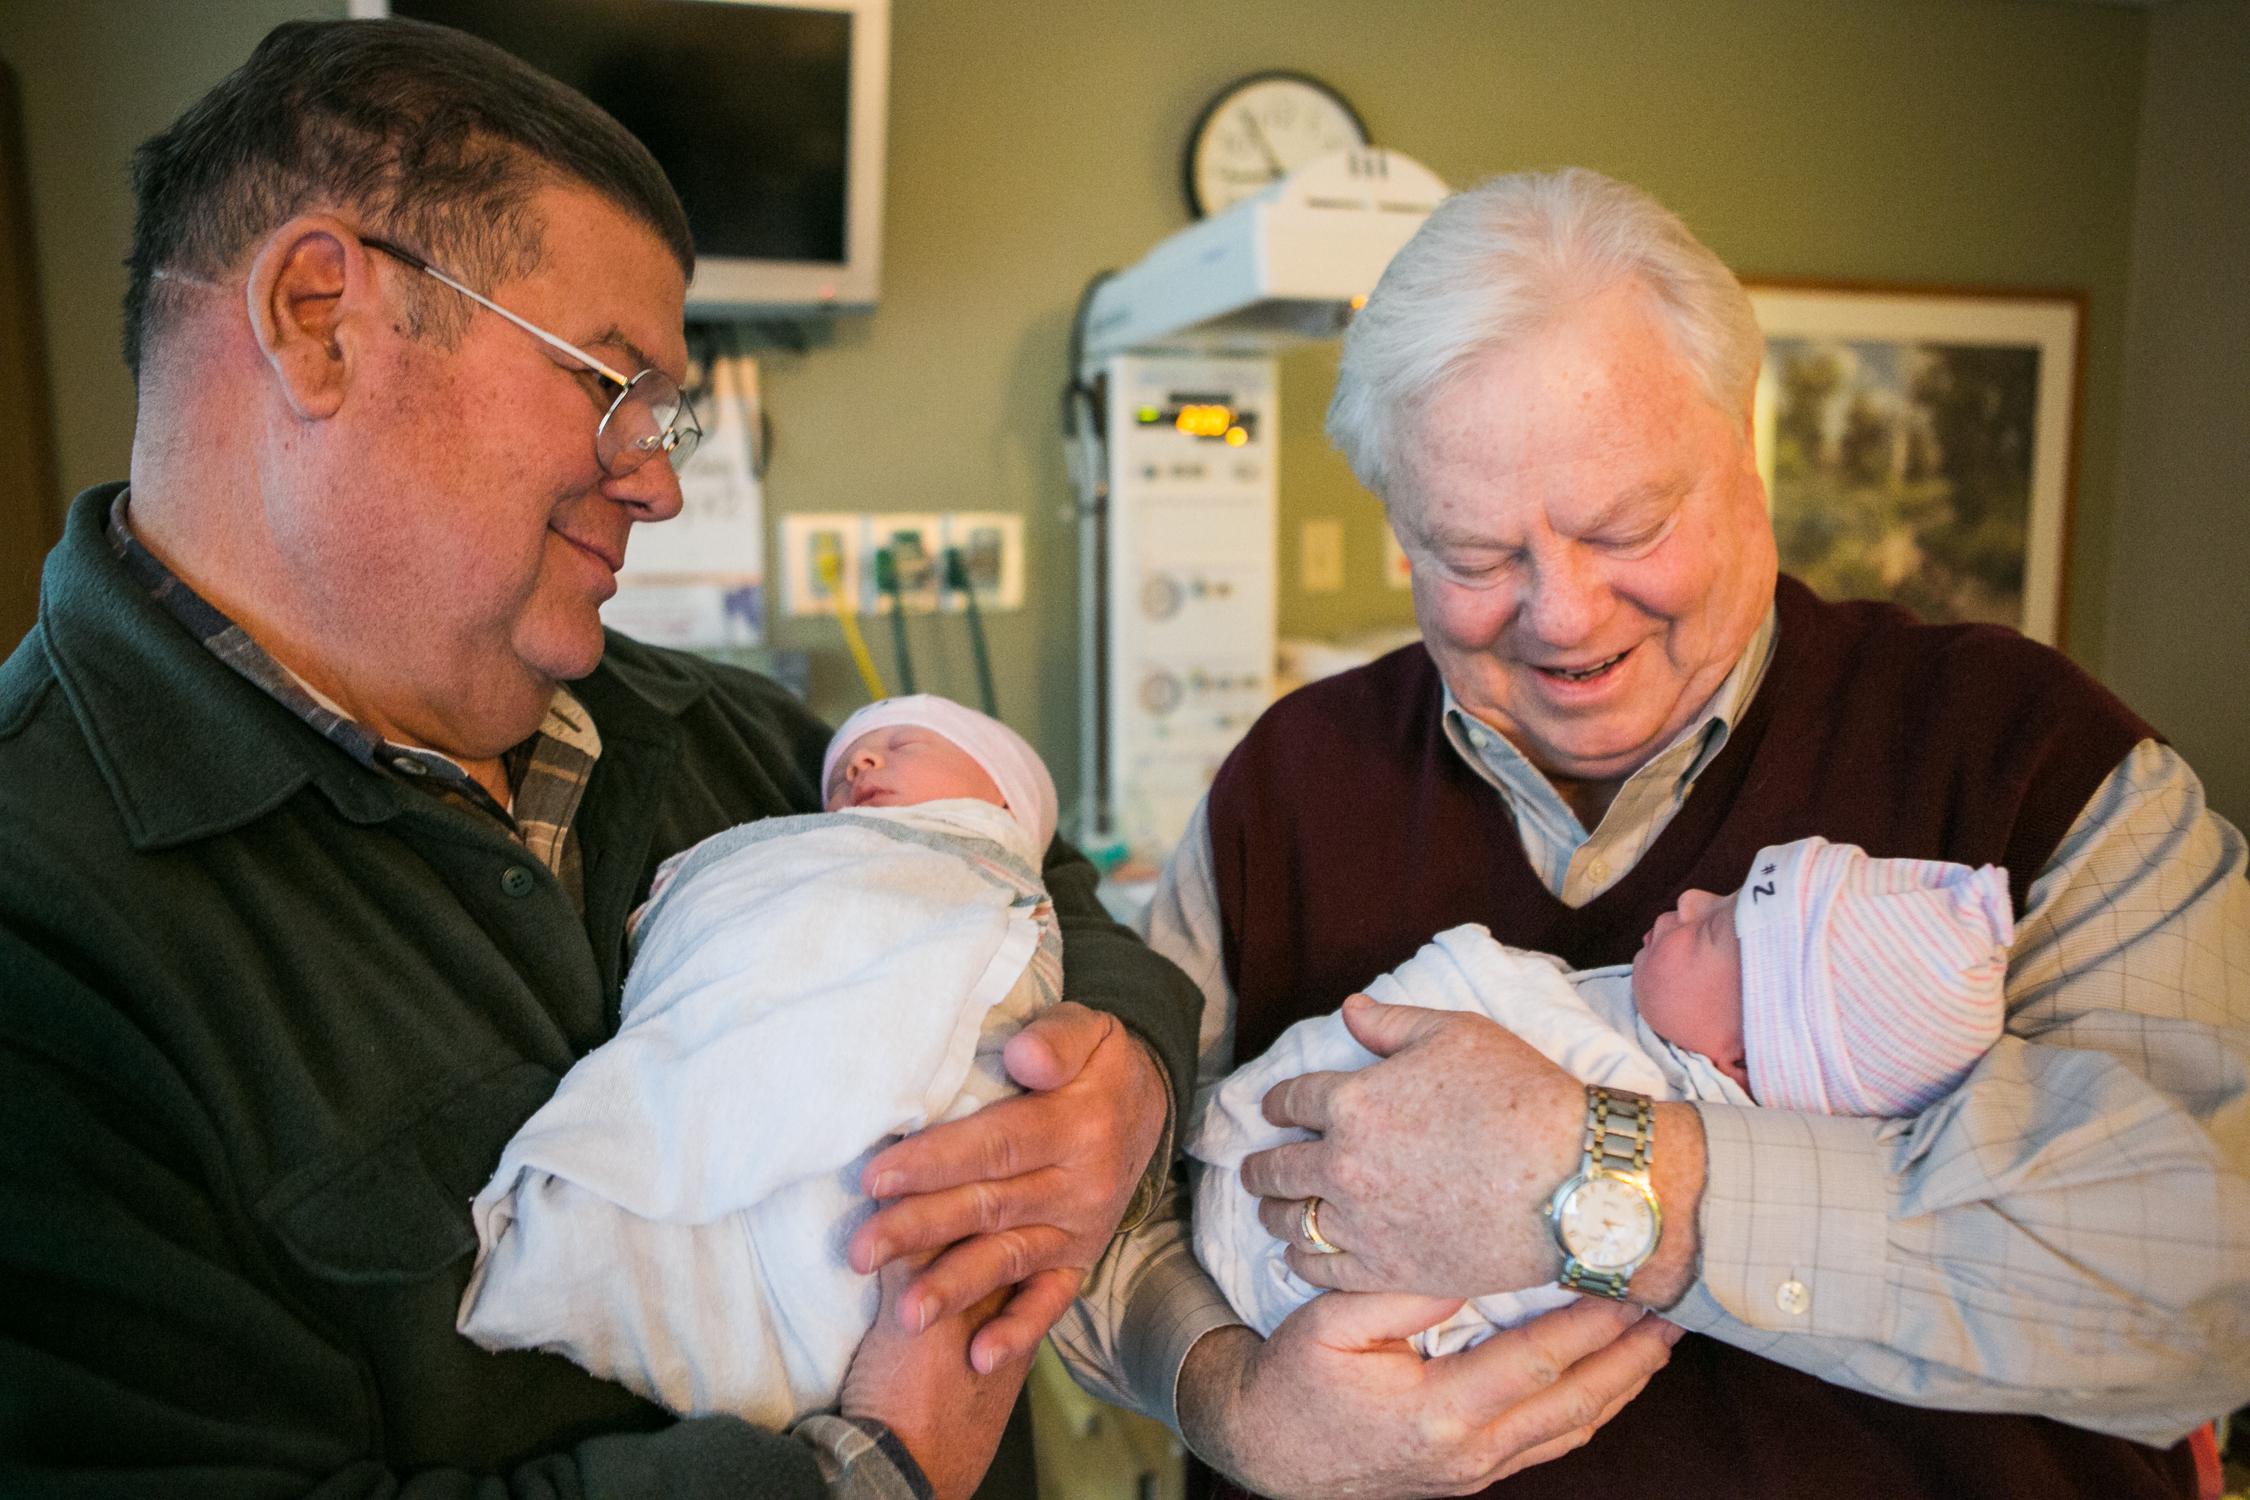 raleigh-birth-photographers-009.JPG